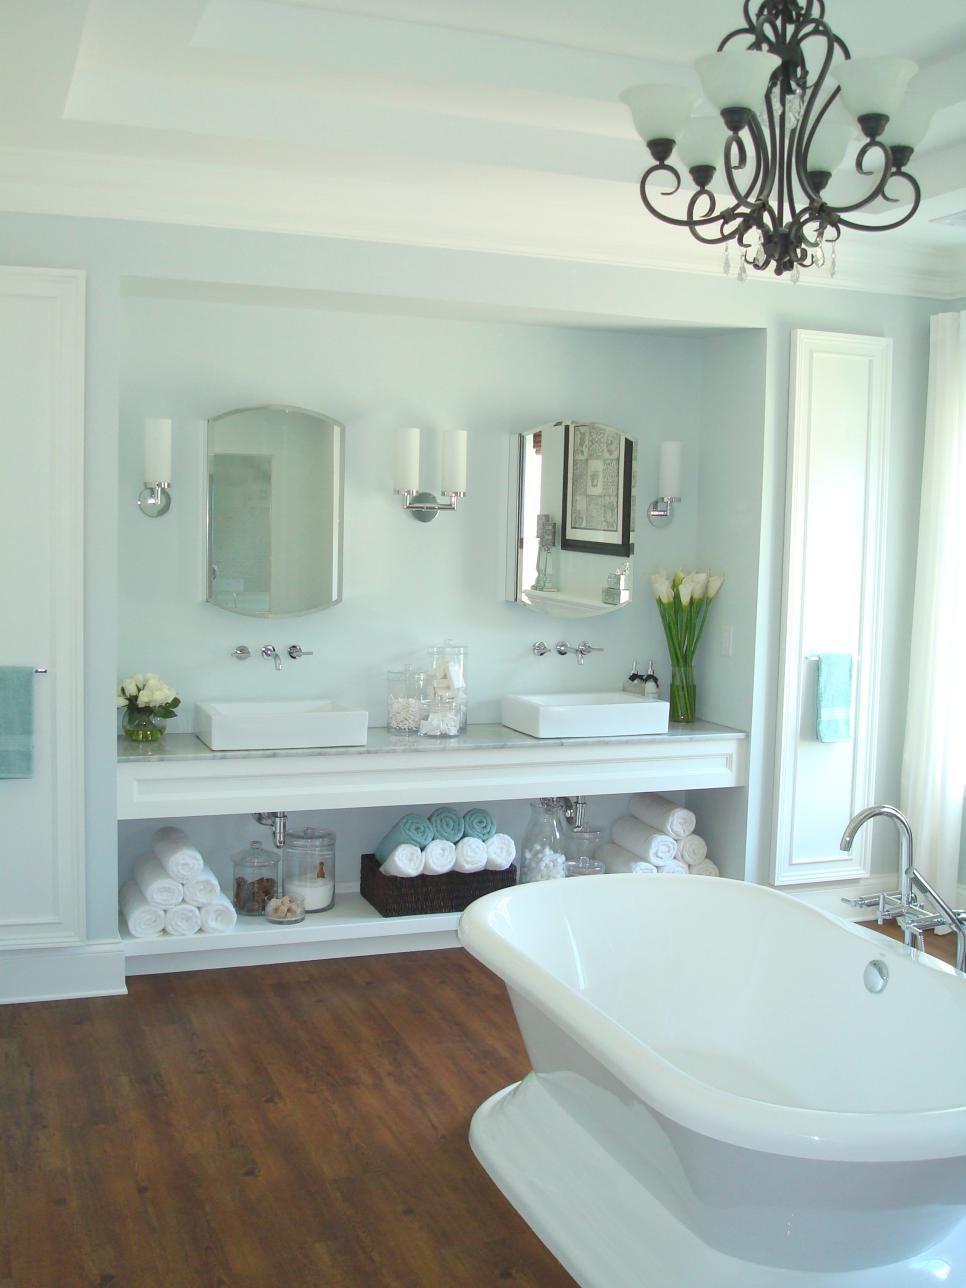 Bathroom Vanities for Any Style | HGTV